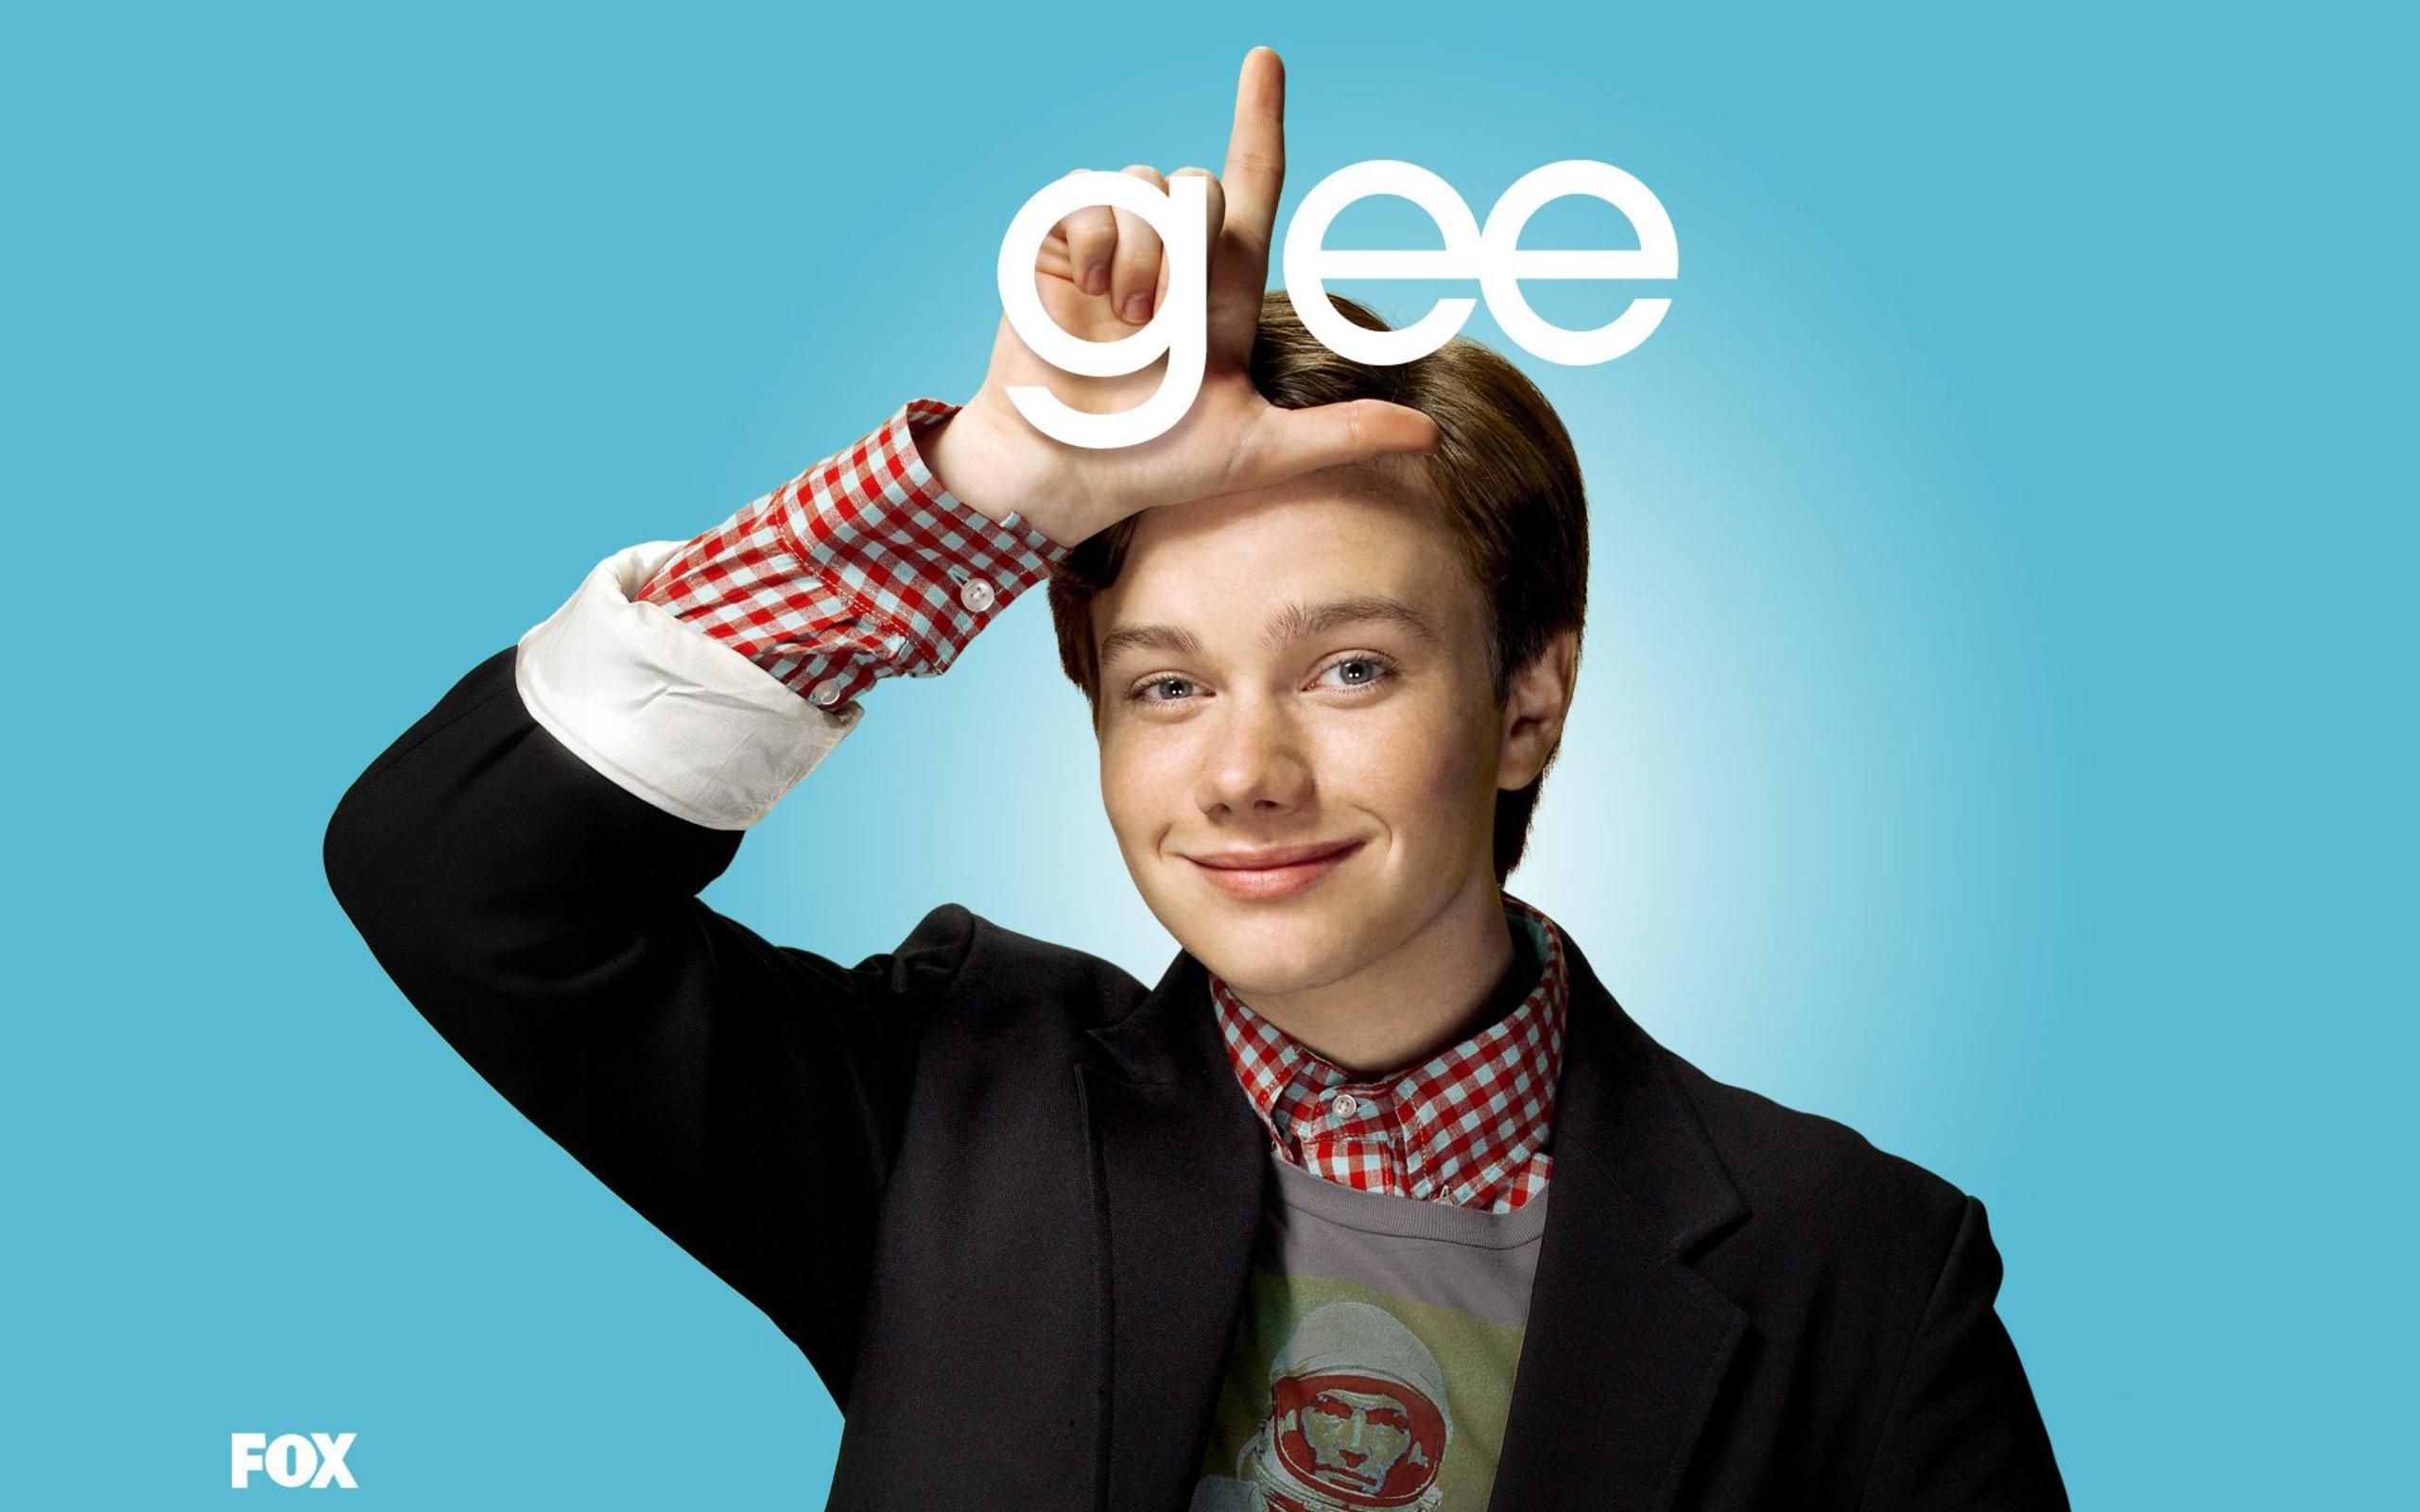 Glee wallpaper 4